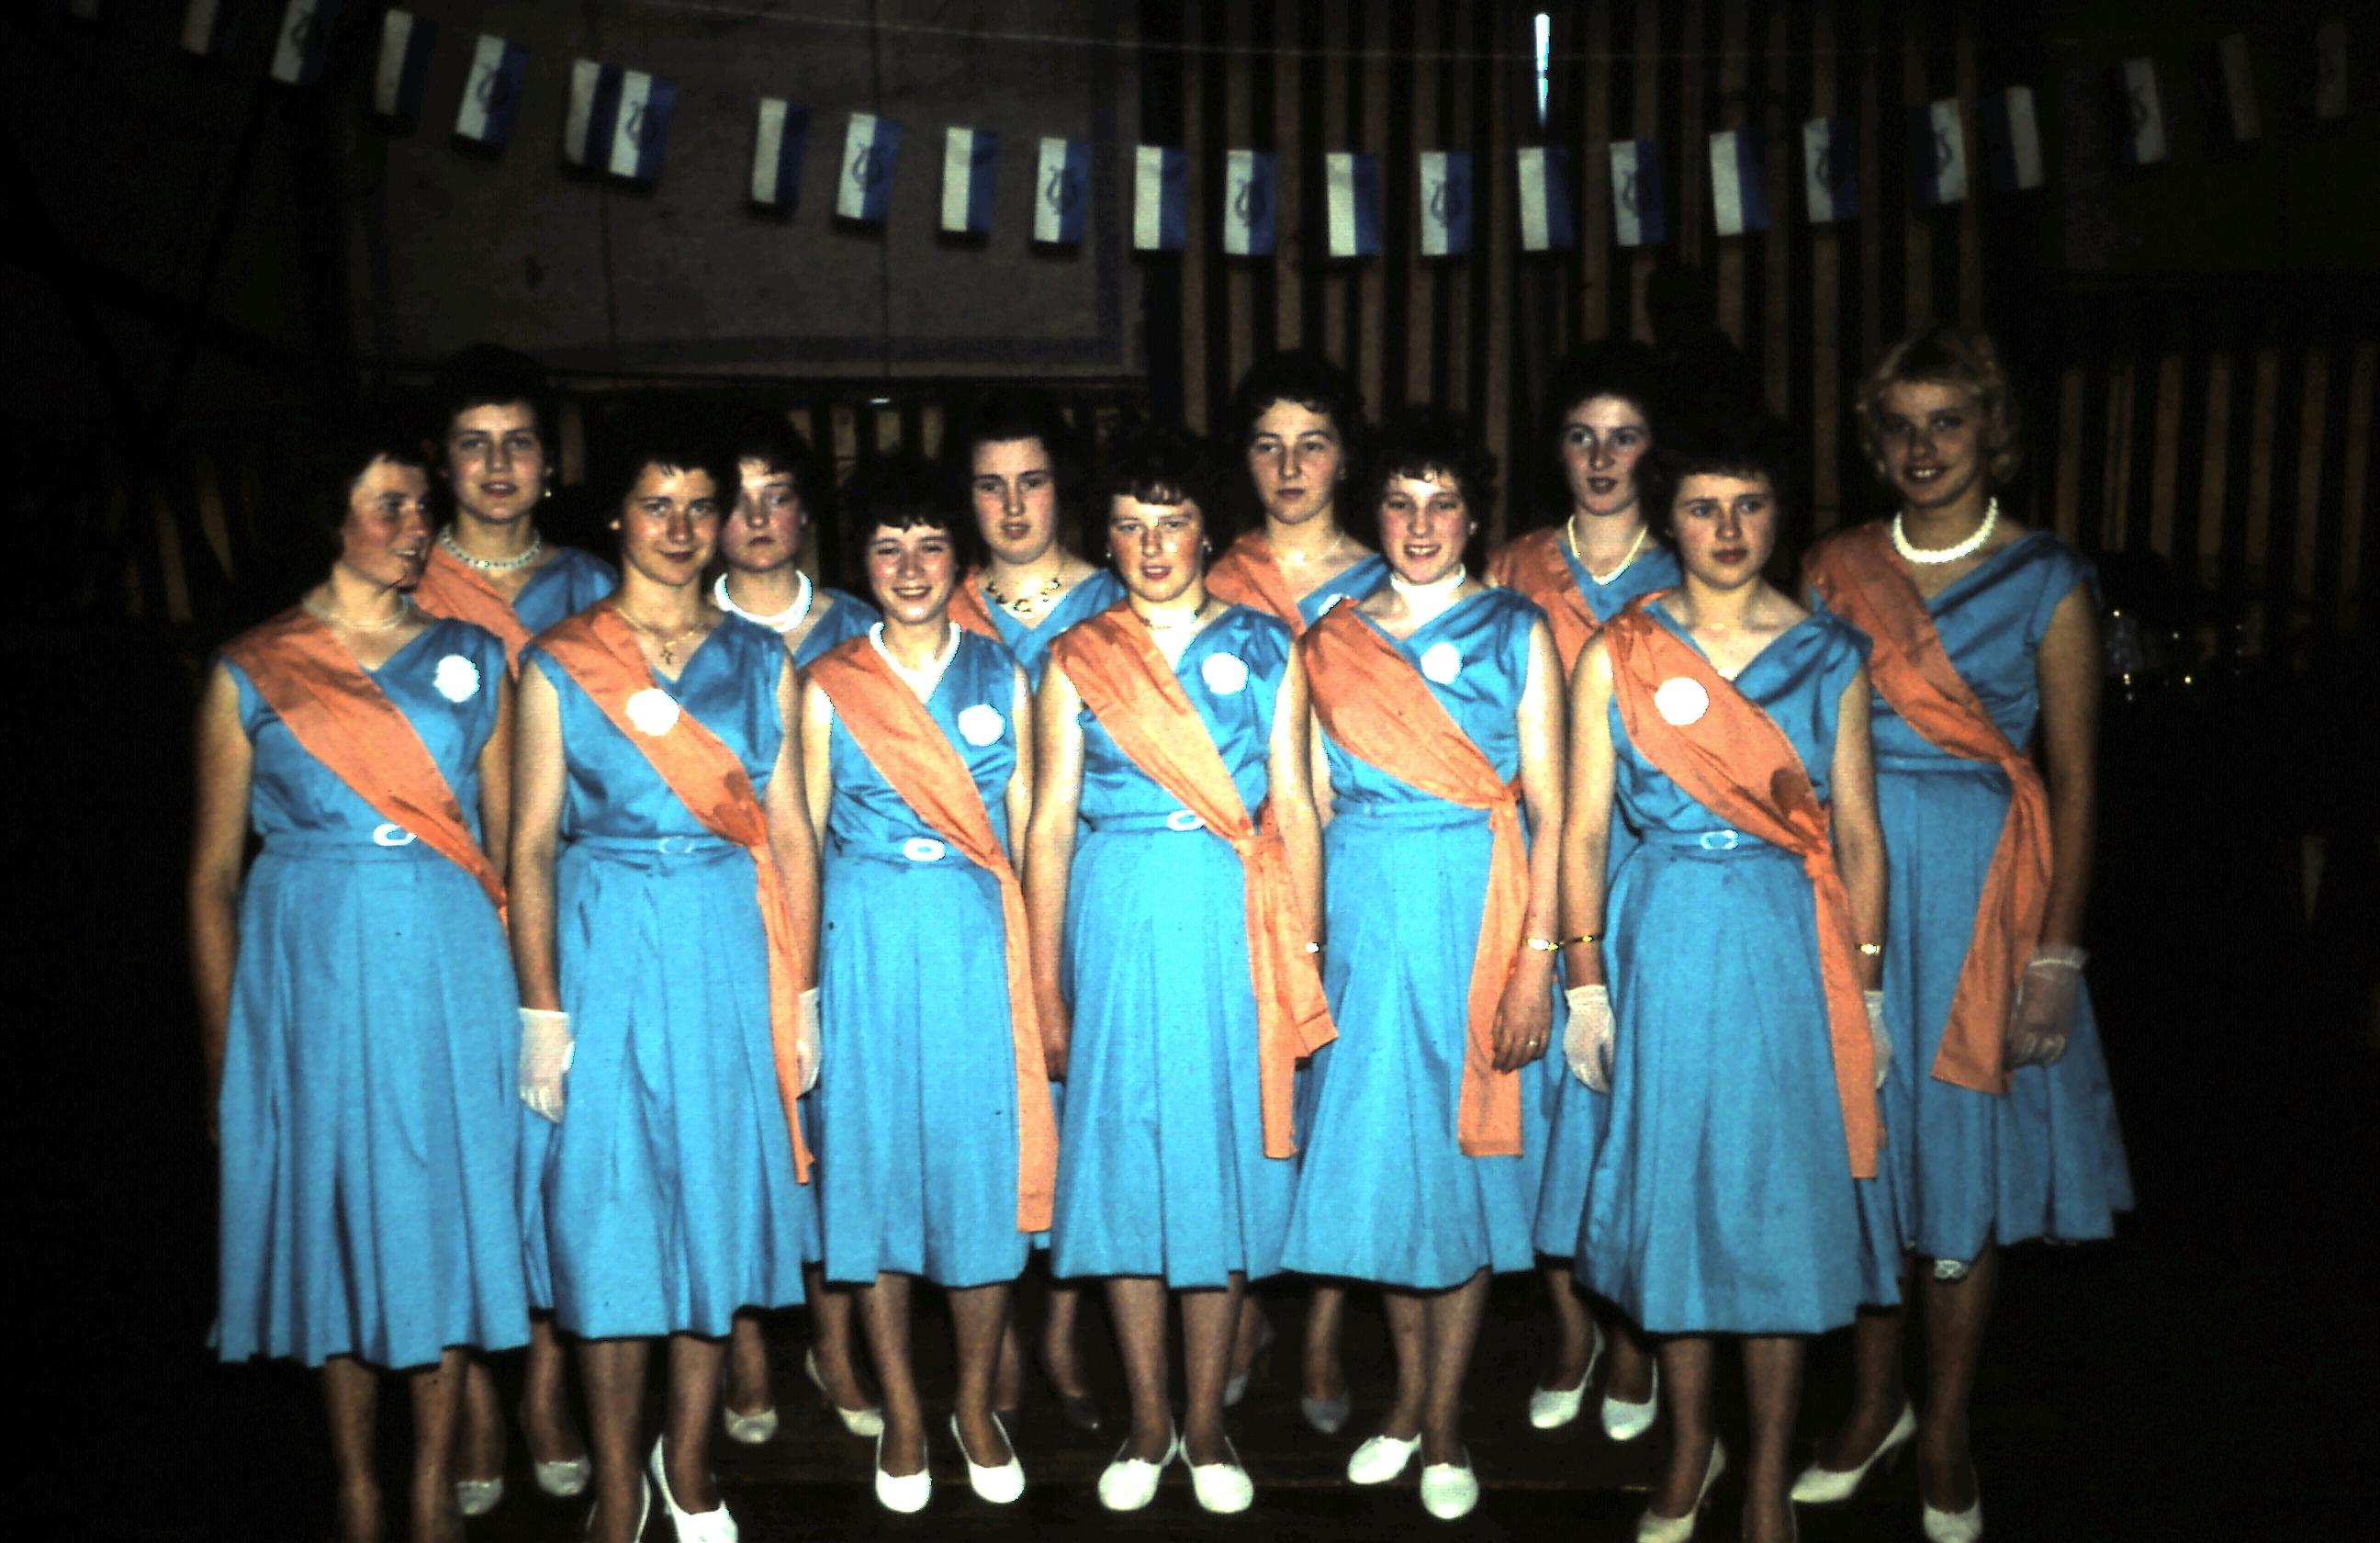 1-saengerfest-1959-0019.jpg